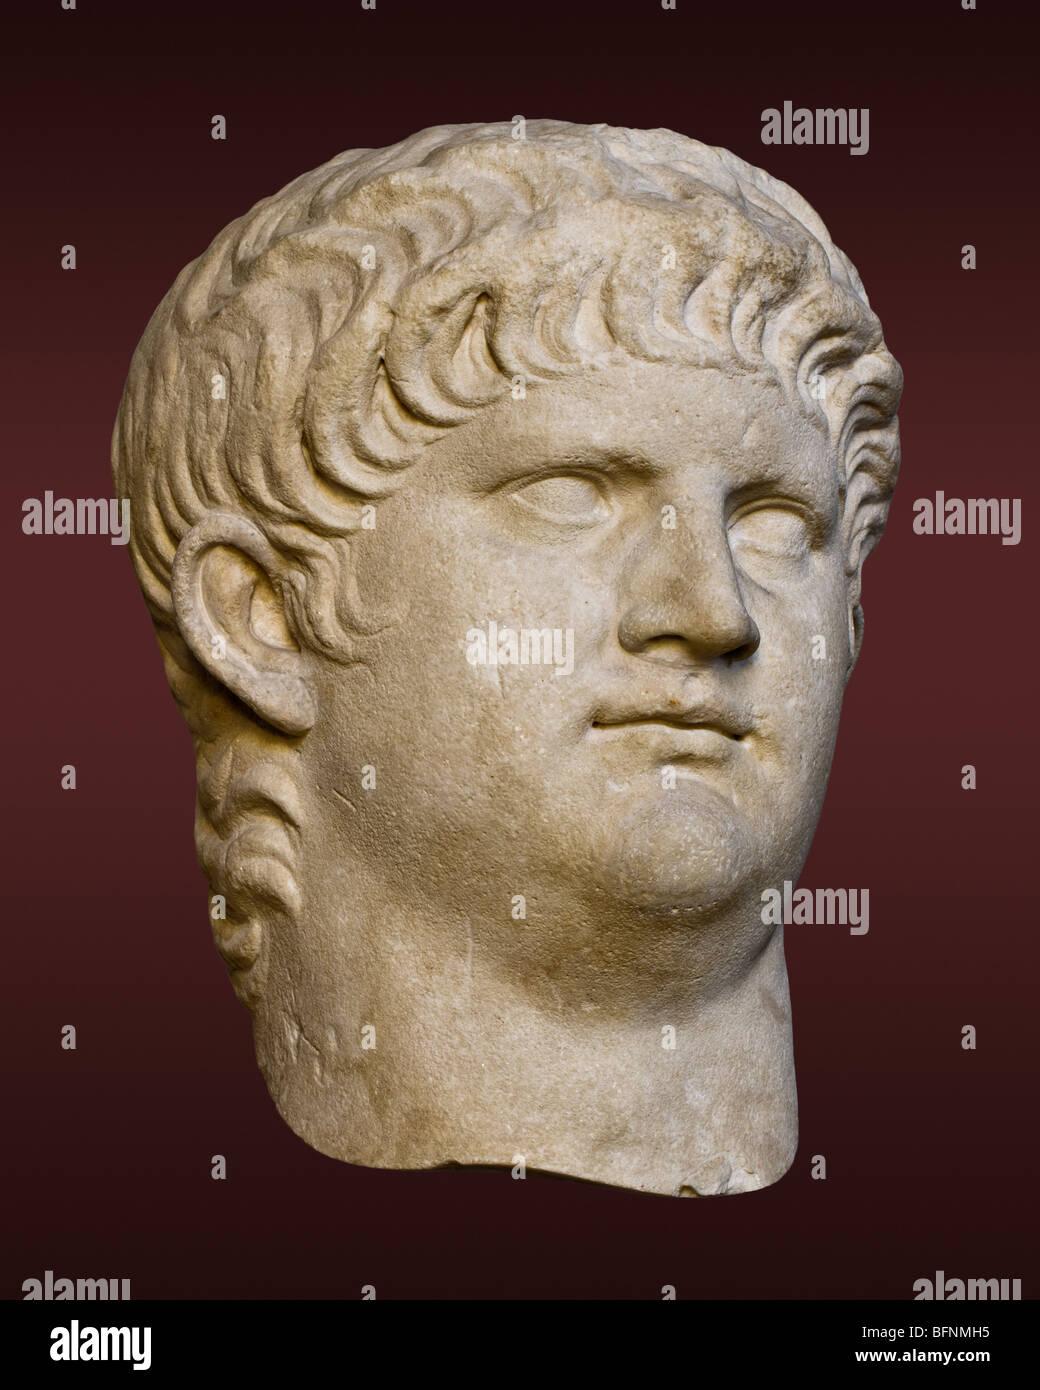 Portait head of the Roman emperor Nero in the Munich Glyptothek, ca. 60. - Stock Image